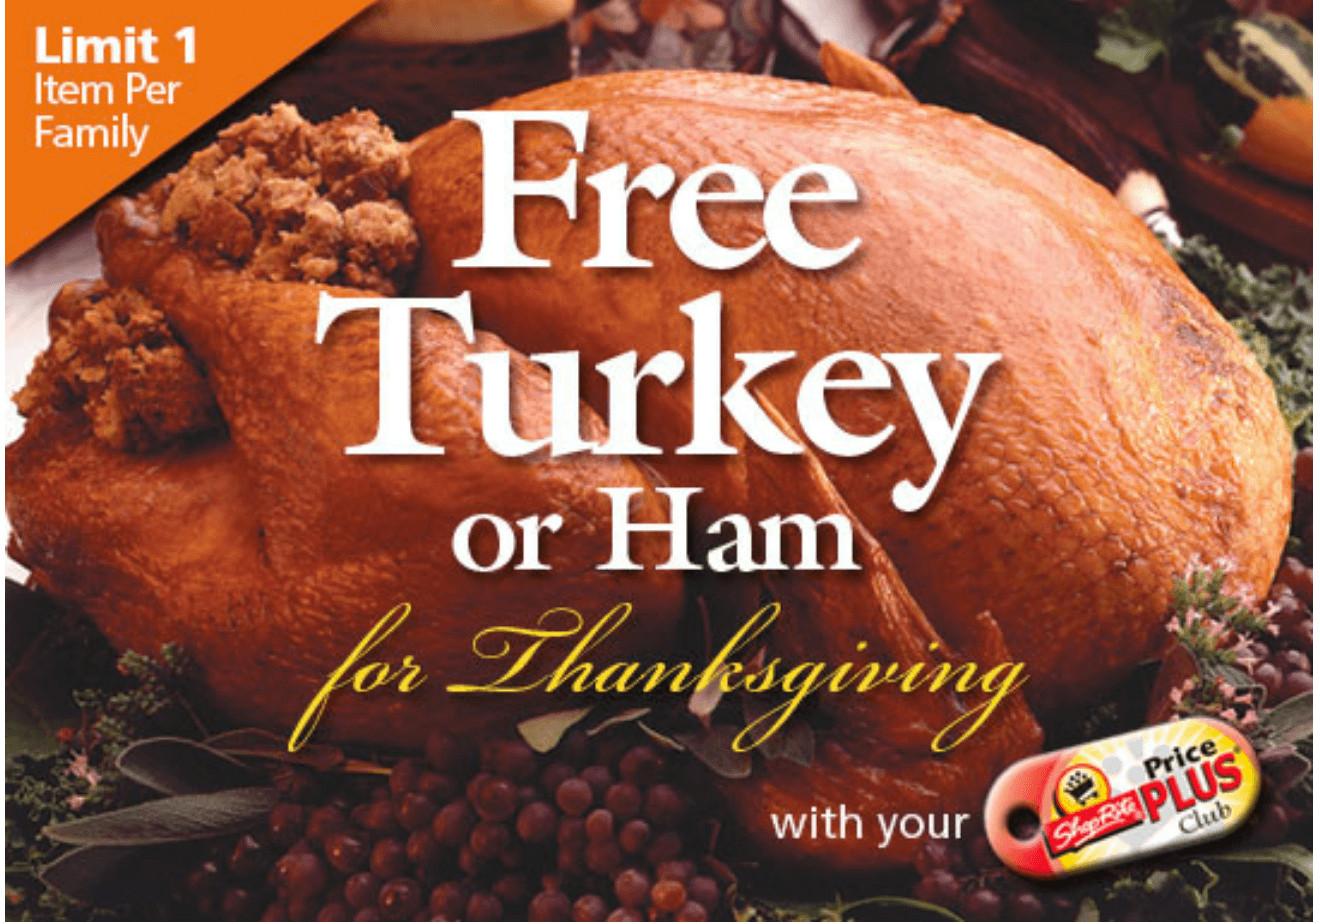 Shoprite Thanksgiving Dinner  ShopRite FREE Turkey or Ham Holiday fer fer is Back